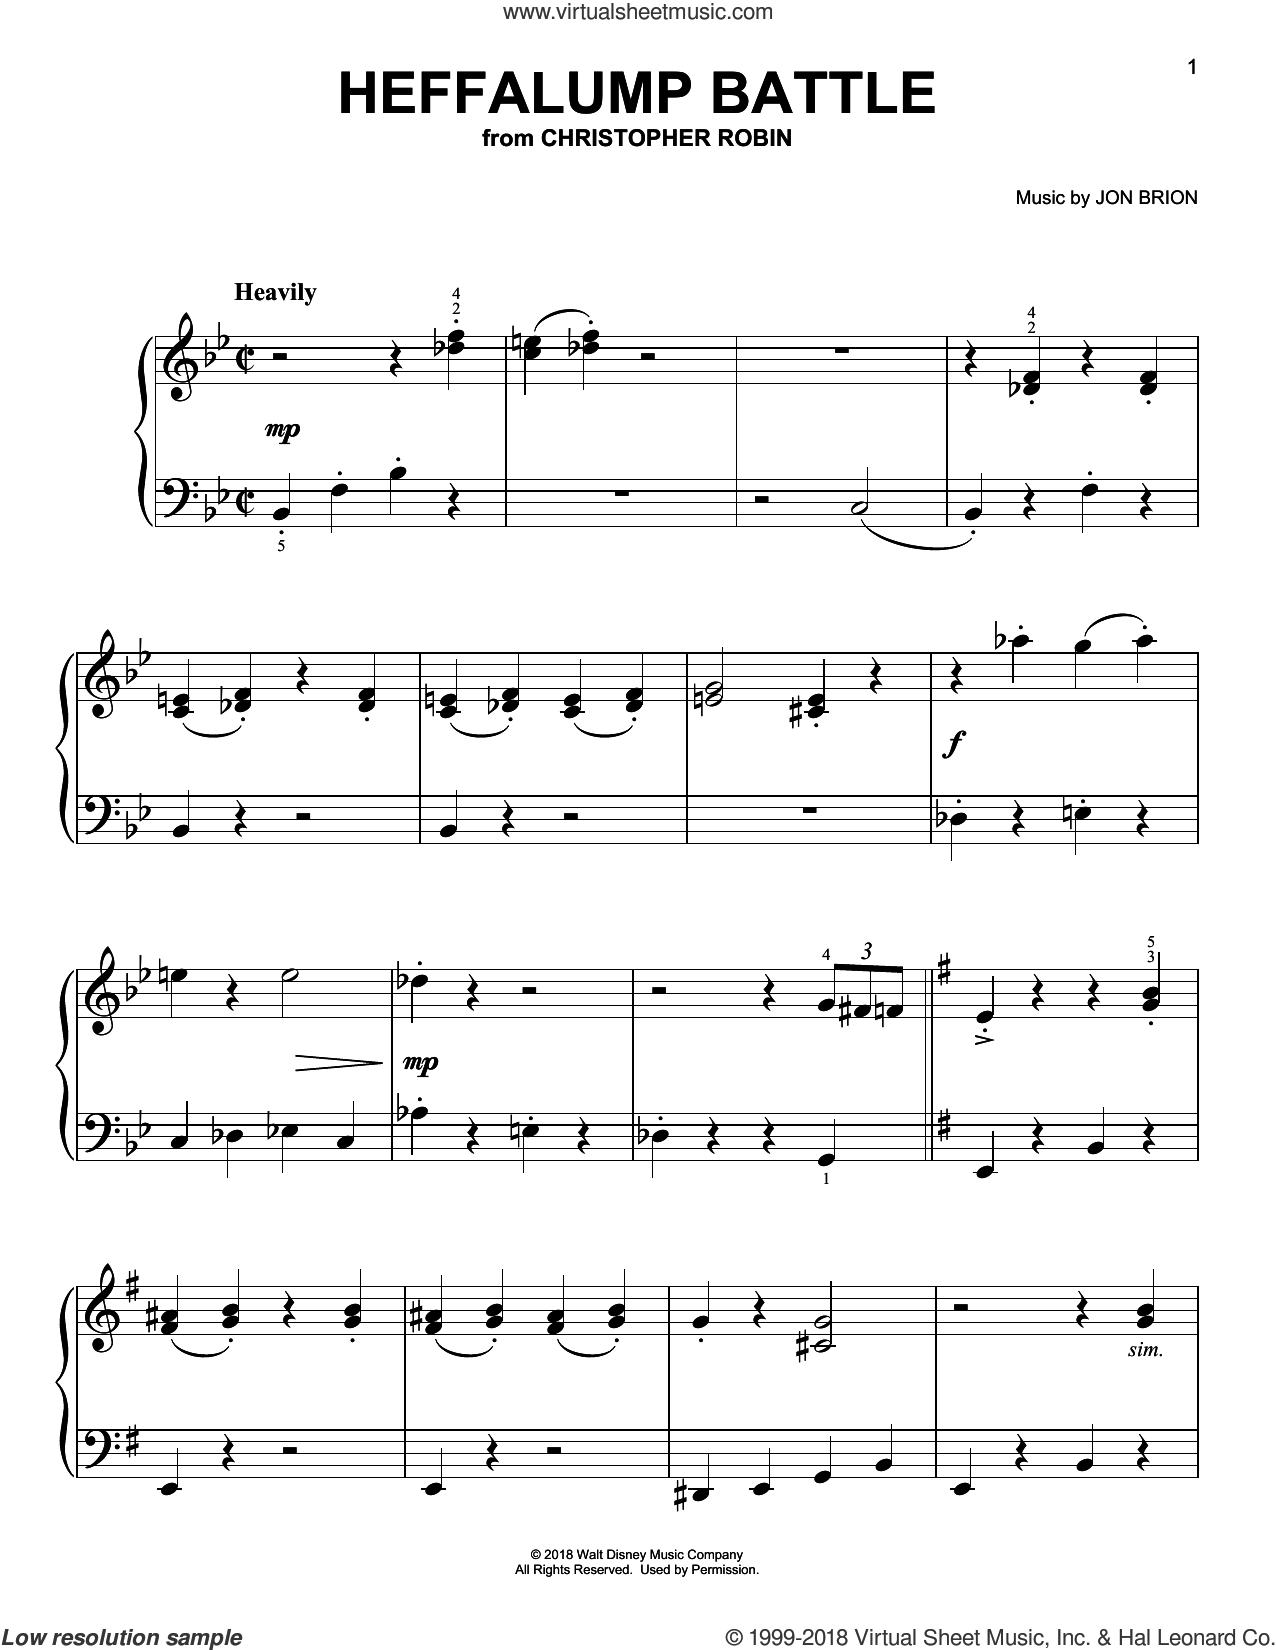 Heffalump Battle (from Christopher Robin) sheet music for piano solo by Geoff Zanelli & Jon Brion, Geoff Zanelli and Jon Brion, easy skill level